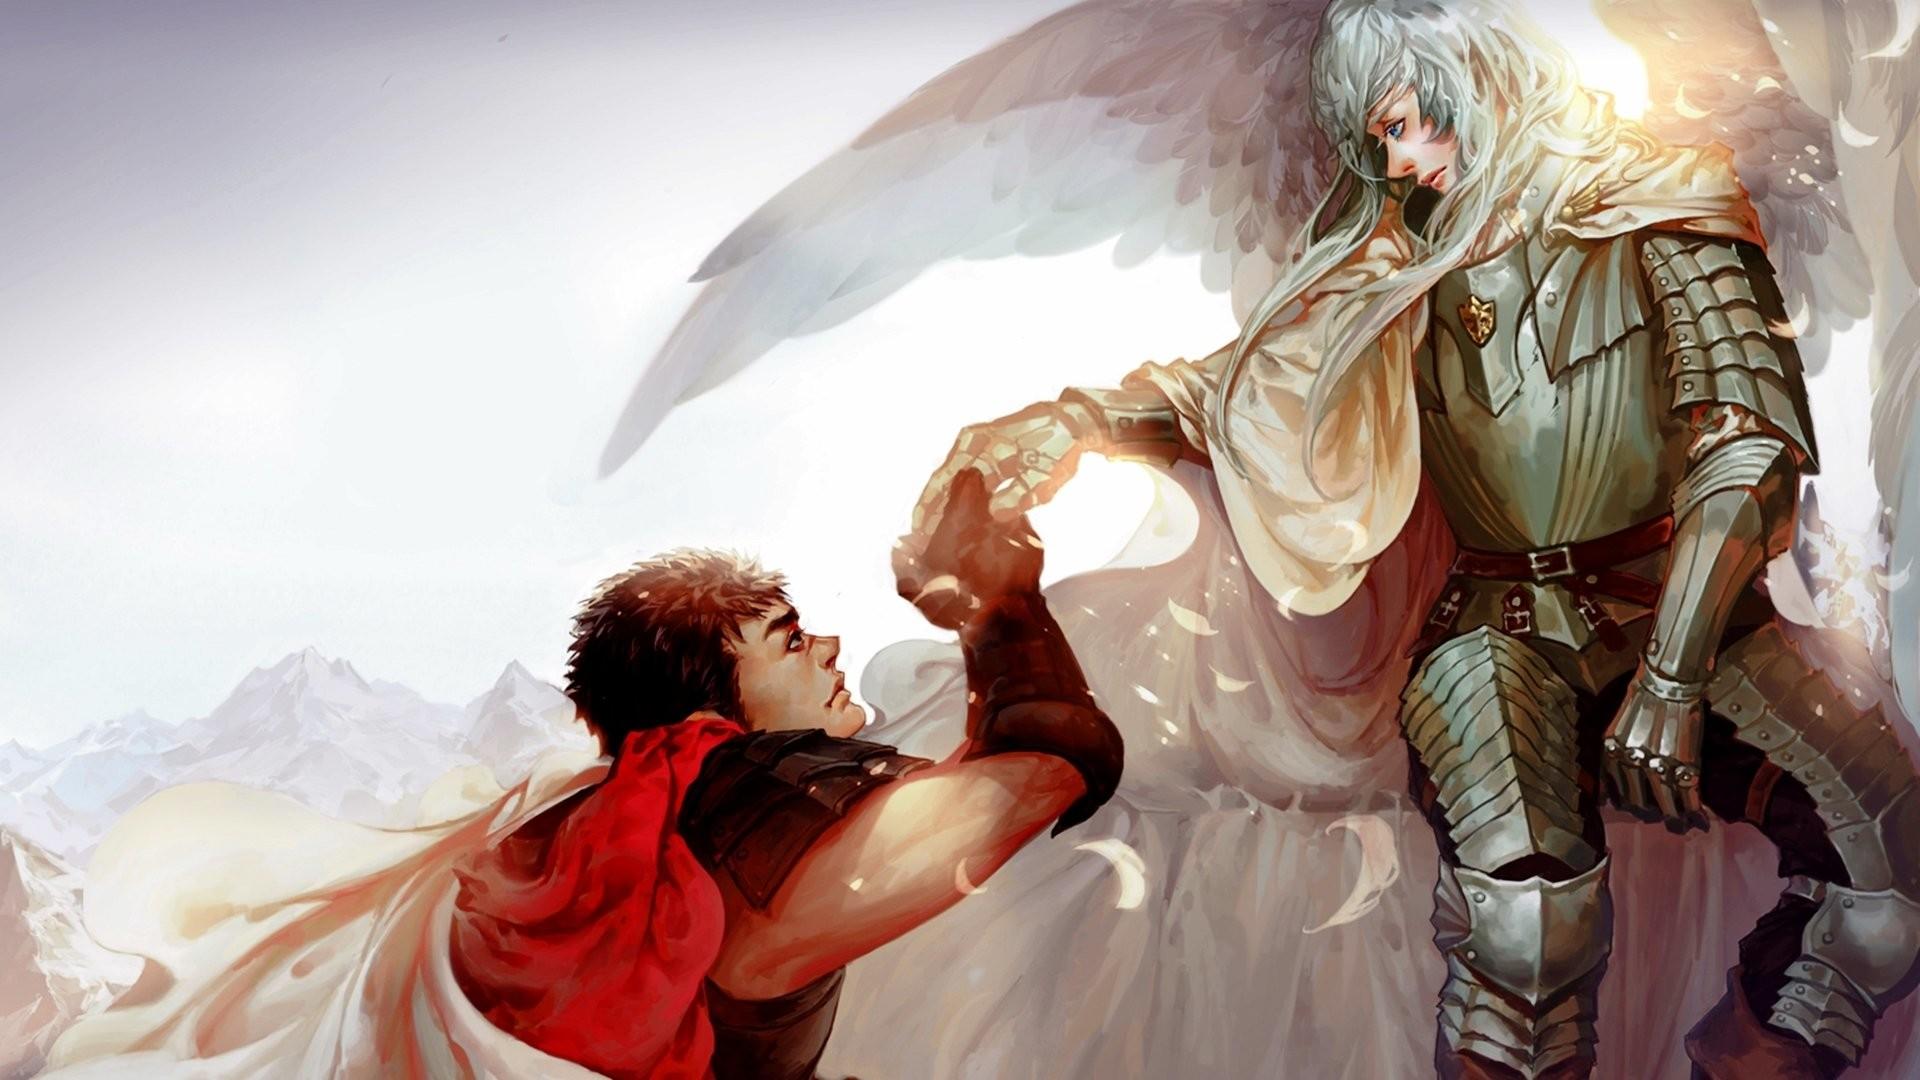 Anime – Berserk Guts (Berserk) Griffith (Berserk) Wallpaper